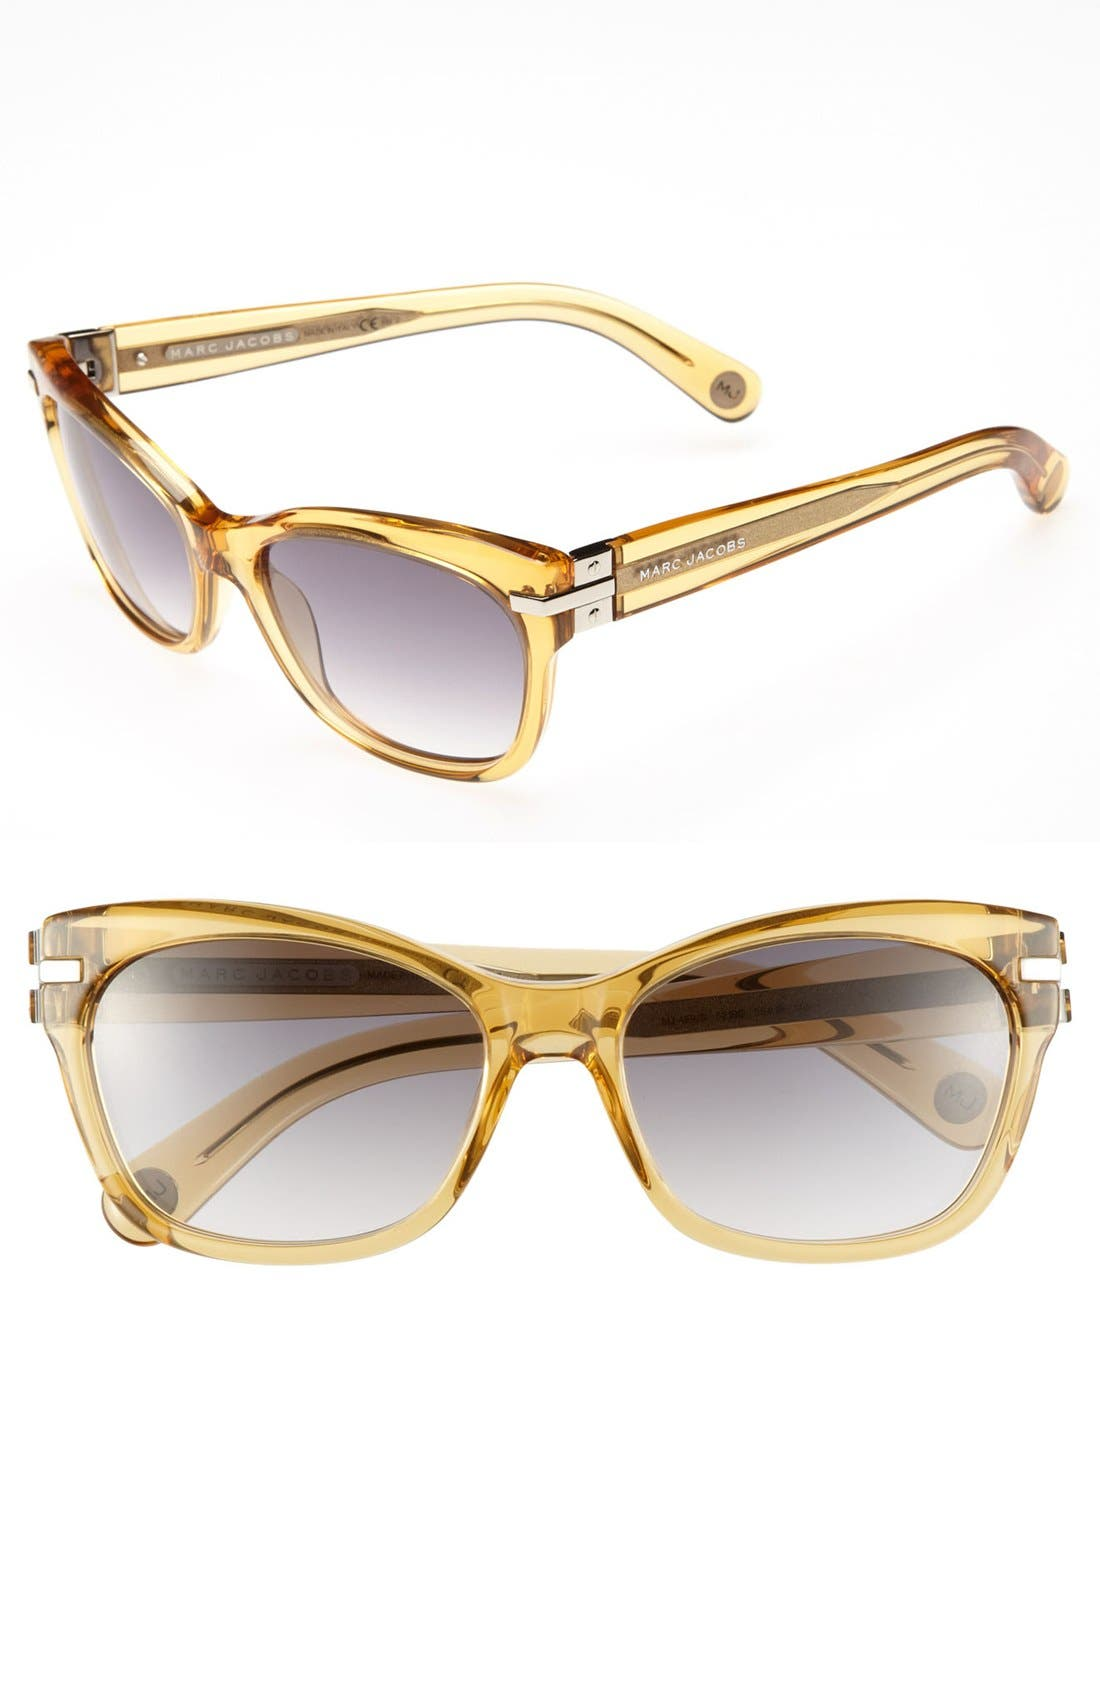 Main Image - MARC JACOBS 56mm Retro Sunglasses